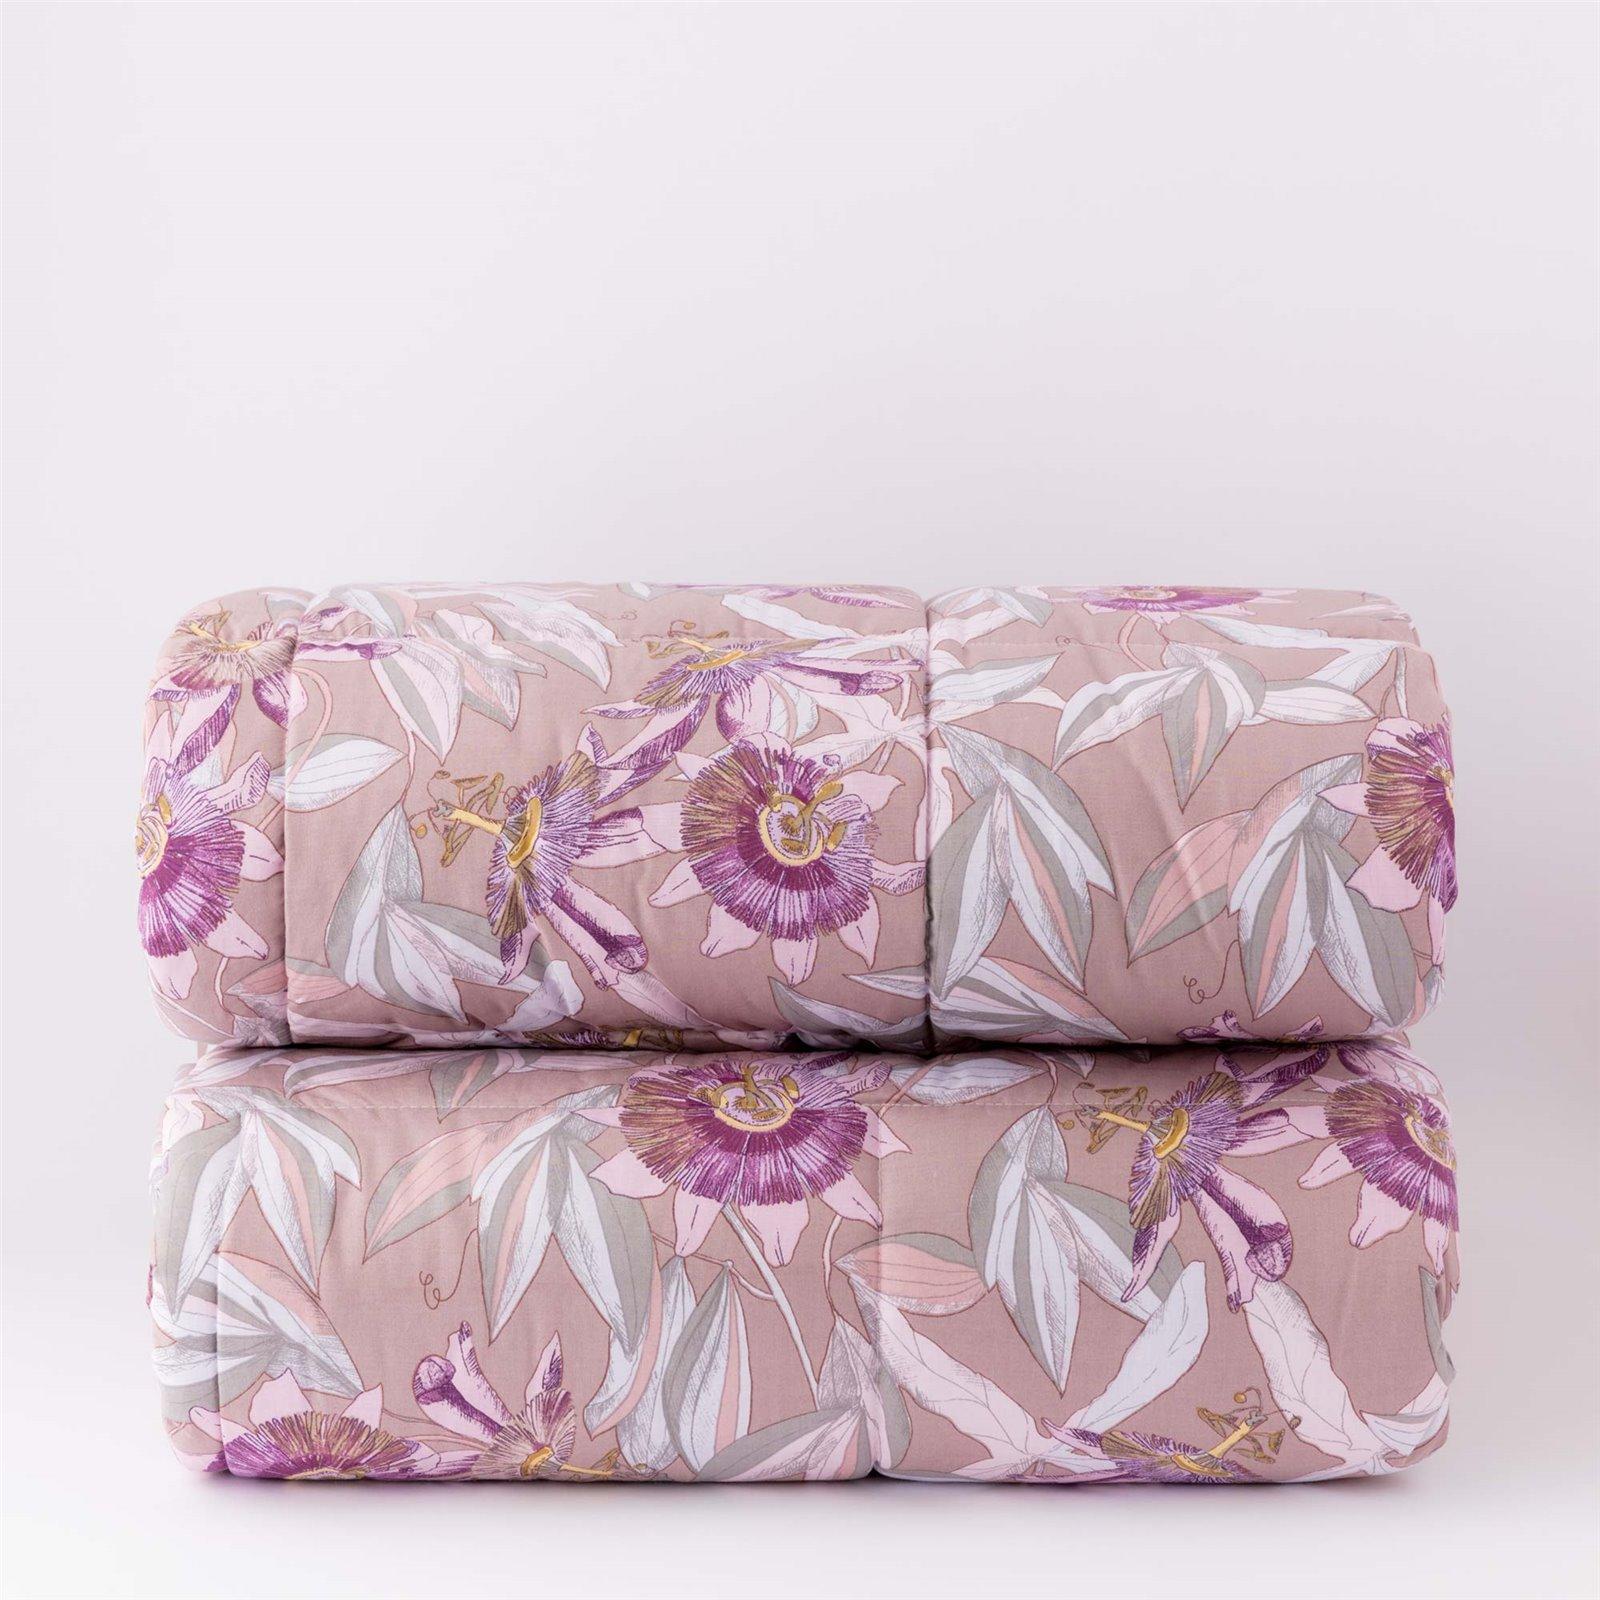 Jacquard Surrey Towel set 1+1